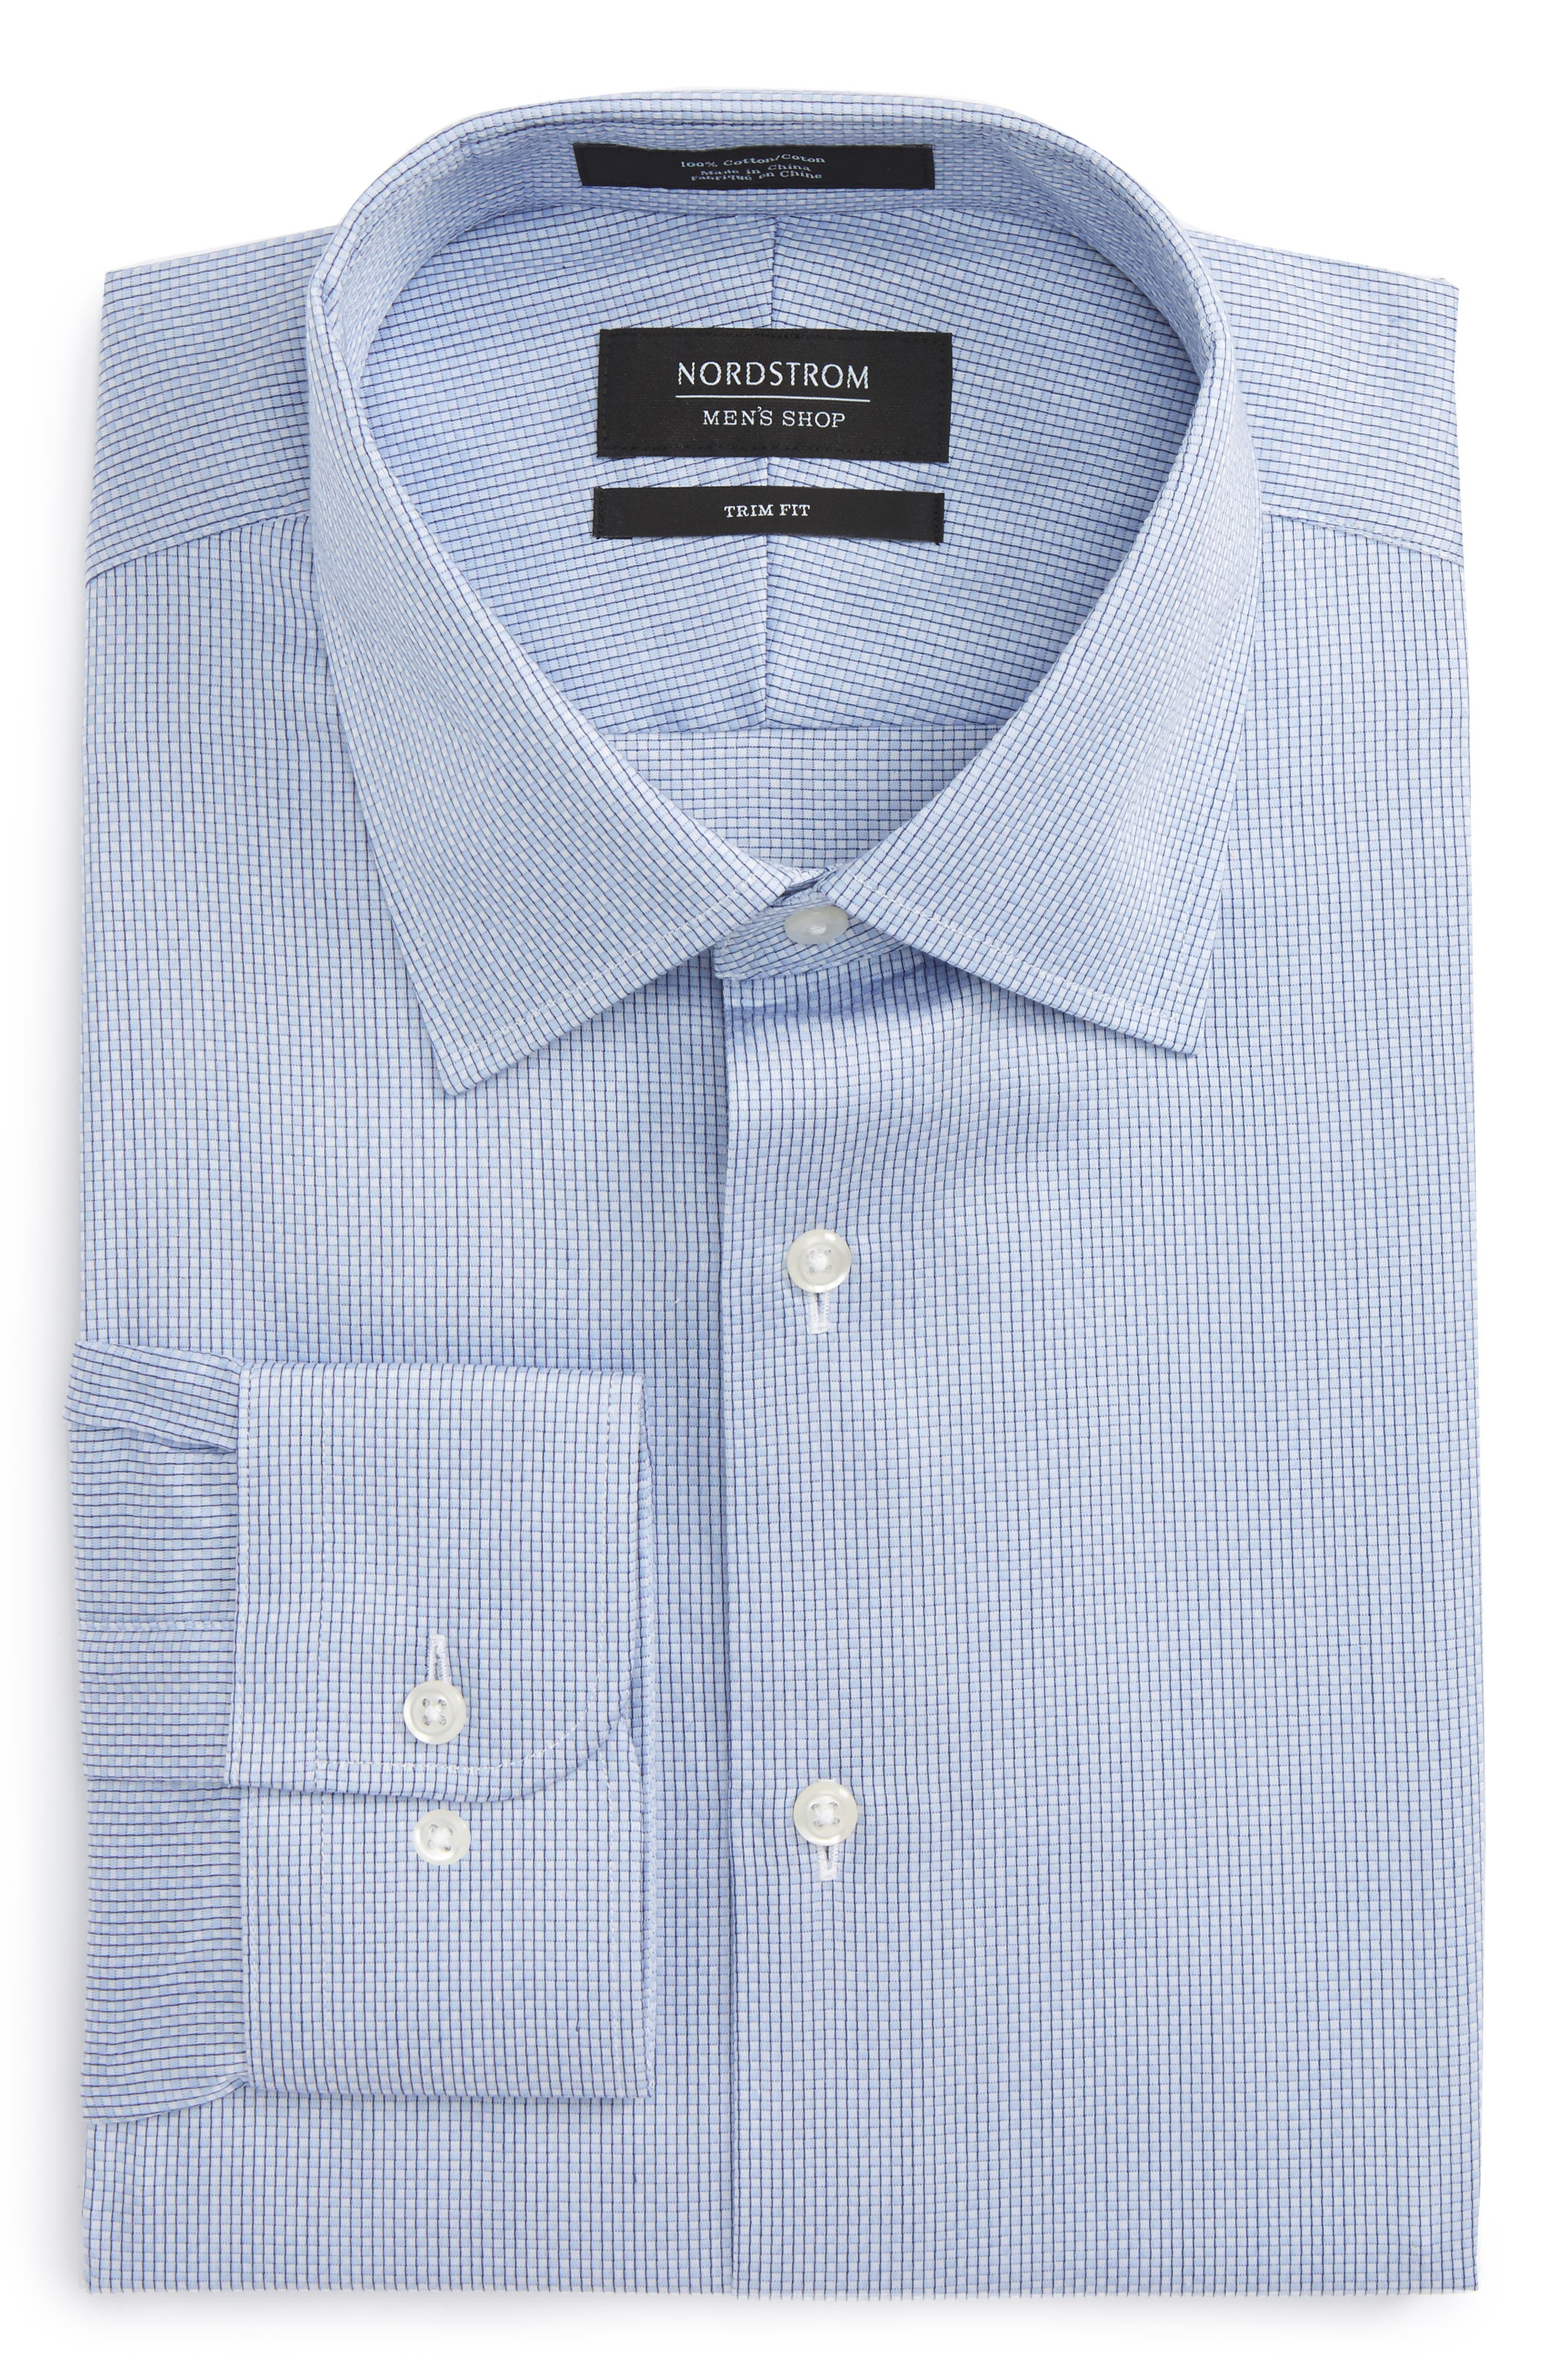 Nordstrom Men's Shop Trim Fit Stripe Dress Shirt